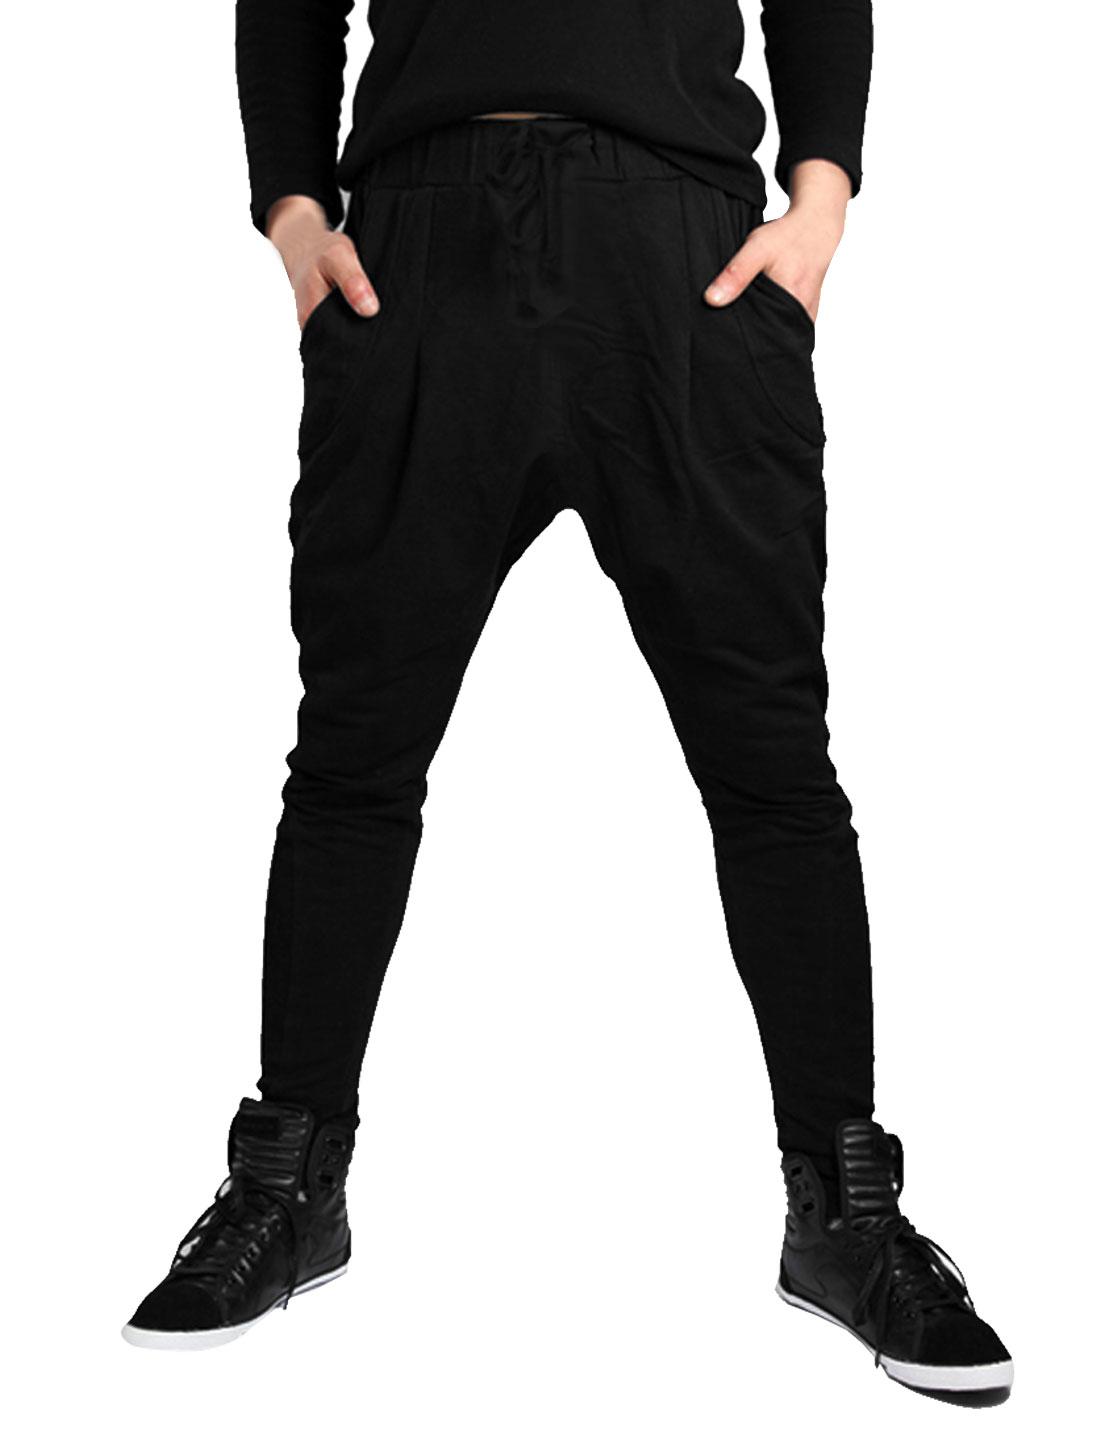 Men Black Stylish Drawstring Elastic Waist Casual Harem Pants W34